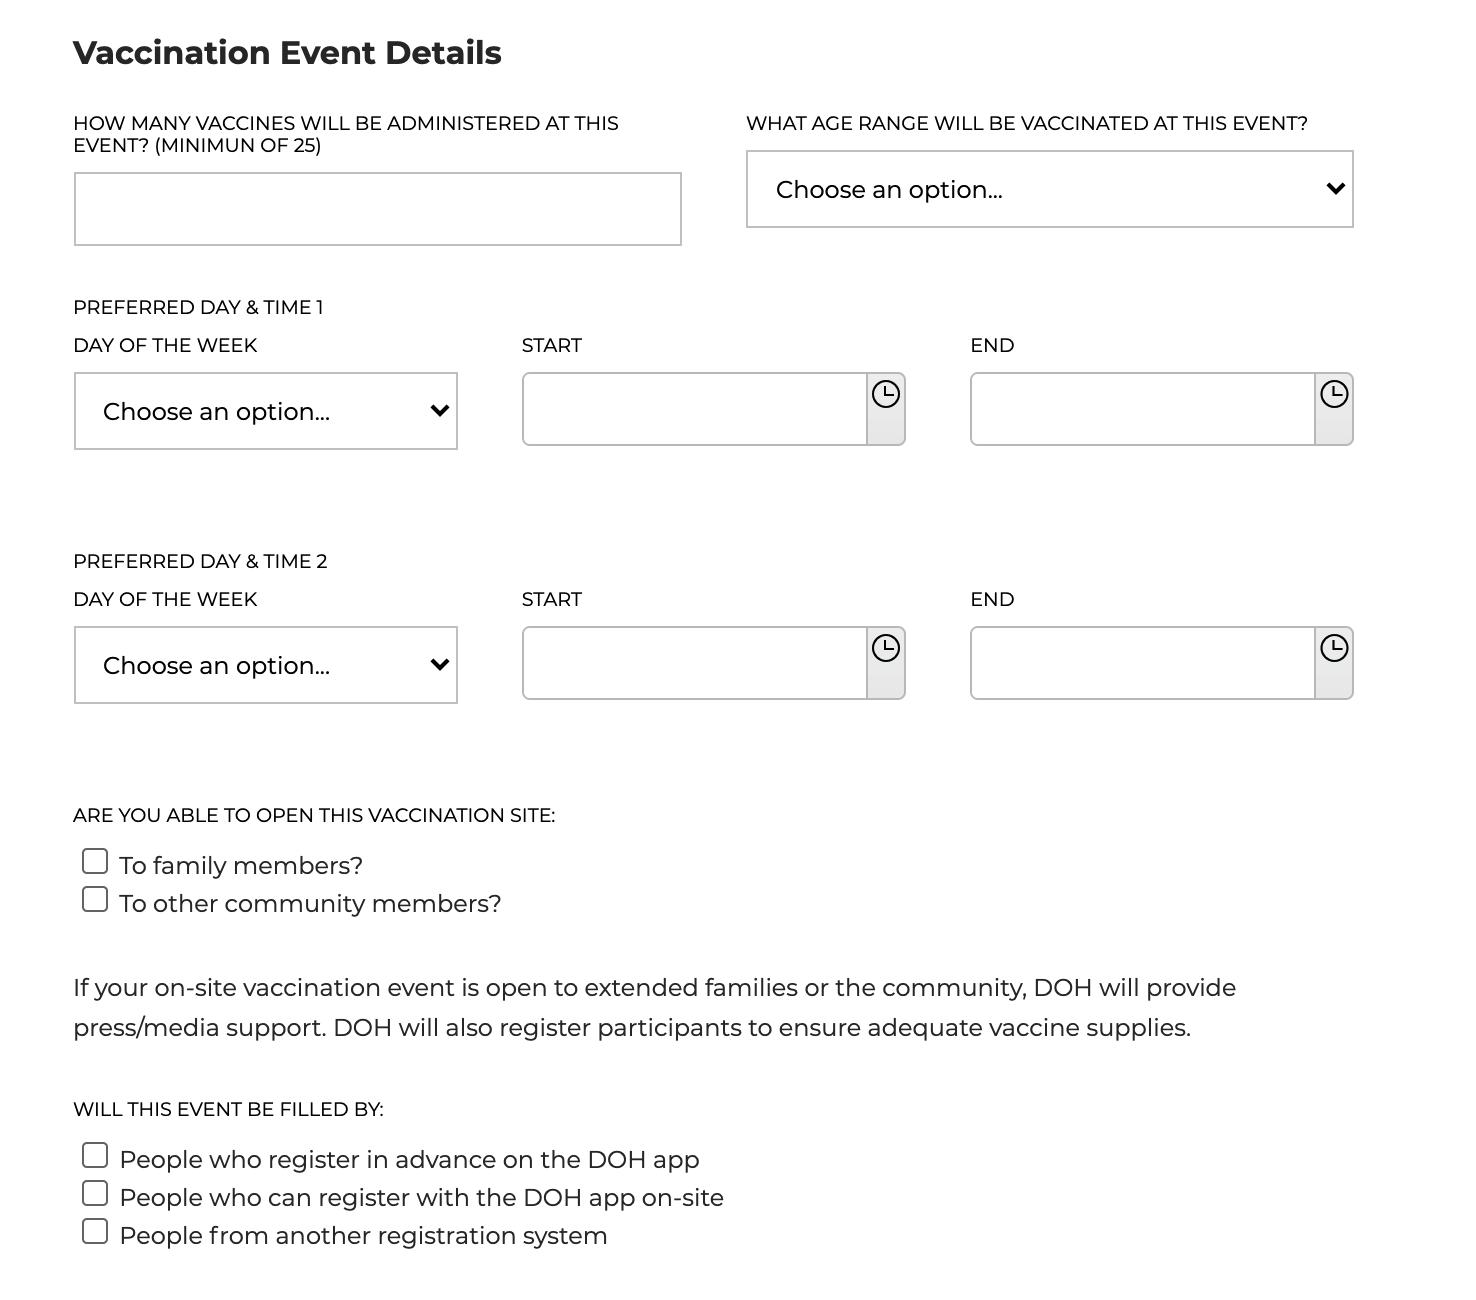 Vaccination event details